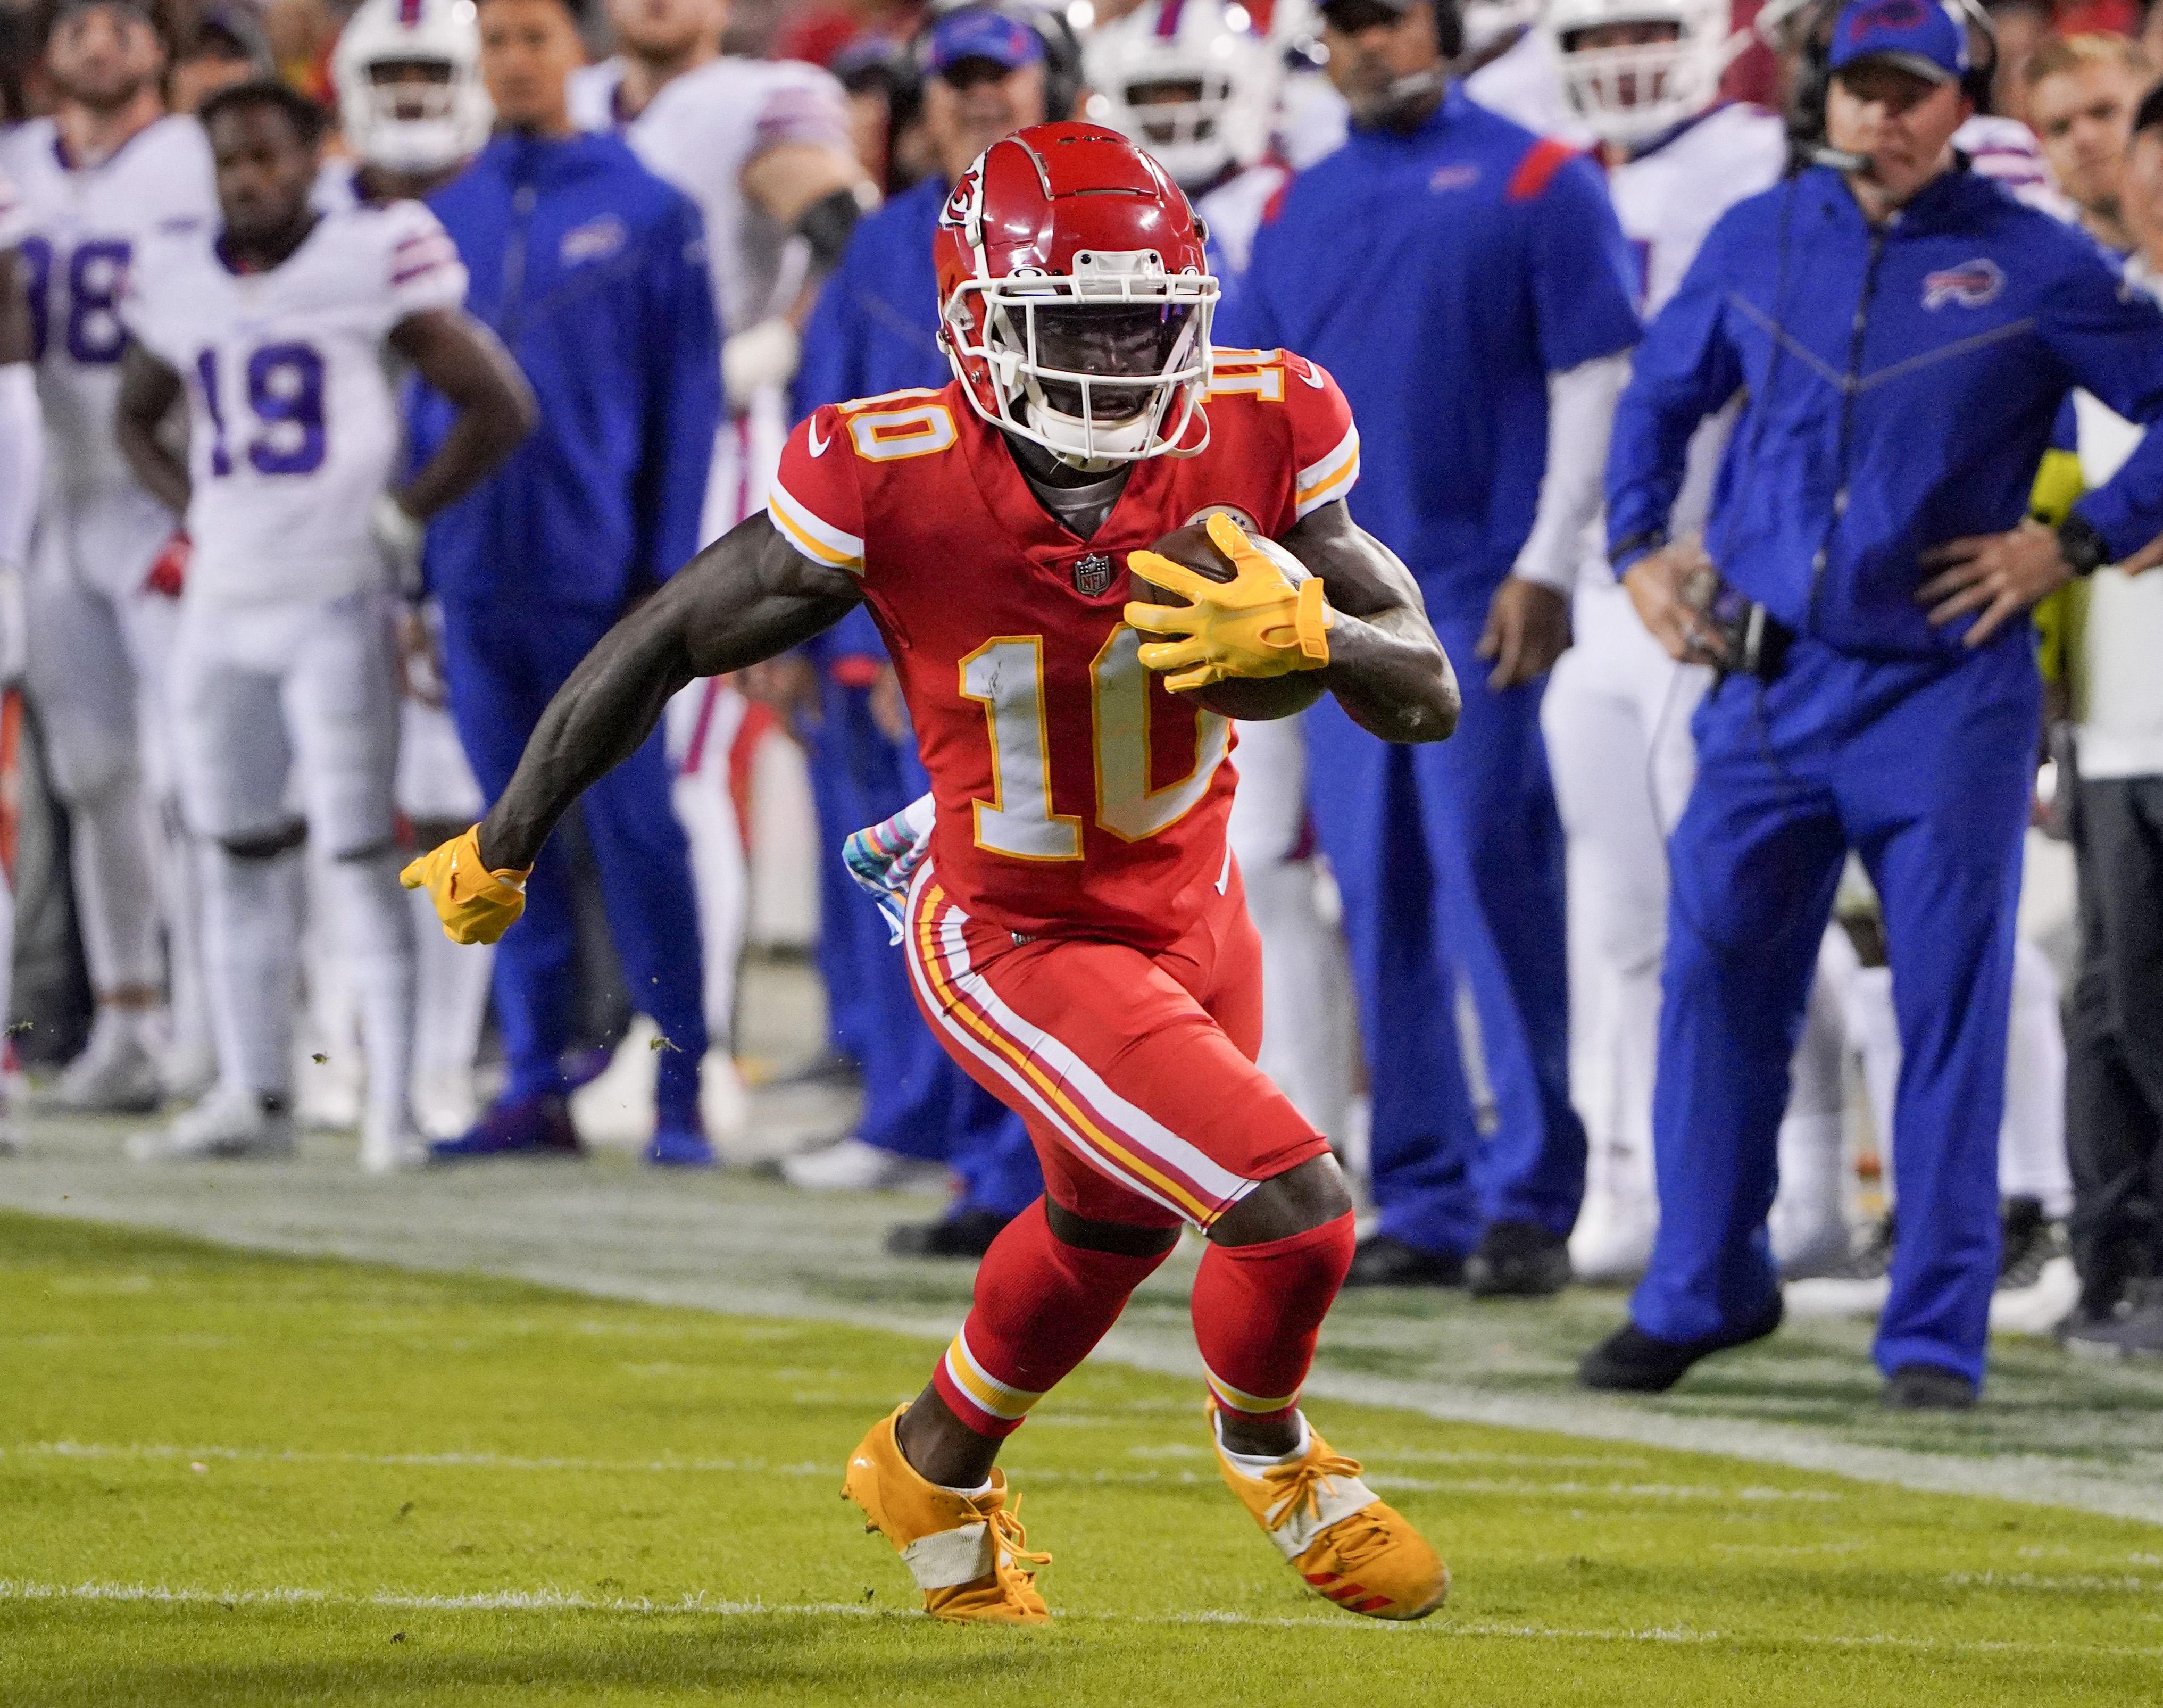 Kansas City Chiefs wide receiver Tyreek Hill (10) runs the ball against the Buffalo Bills during the first half at GEHA Field at Arrowhead Stadium.